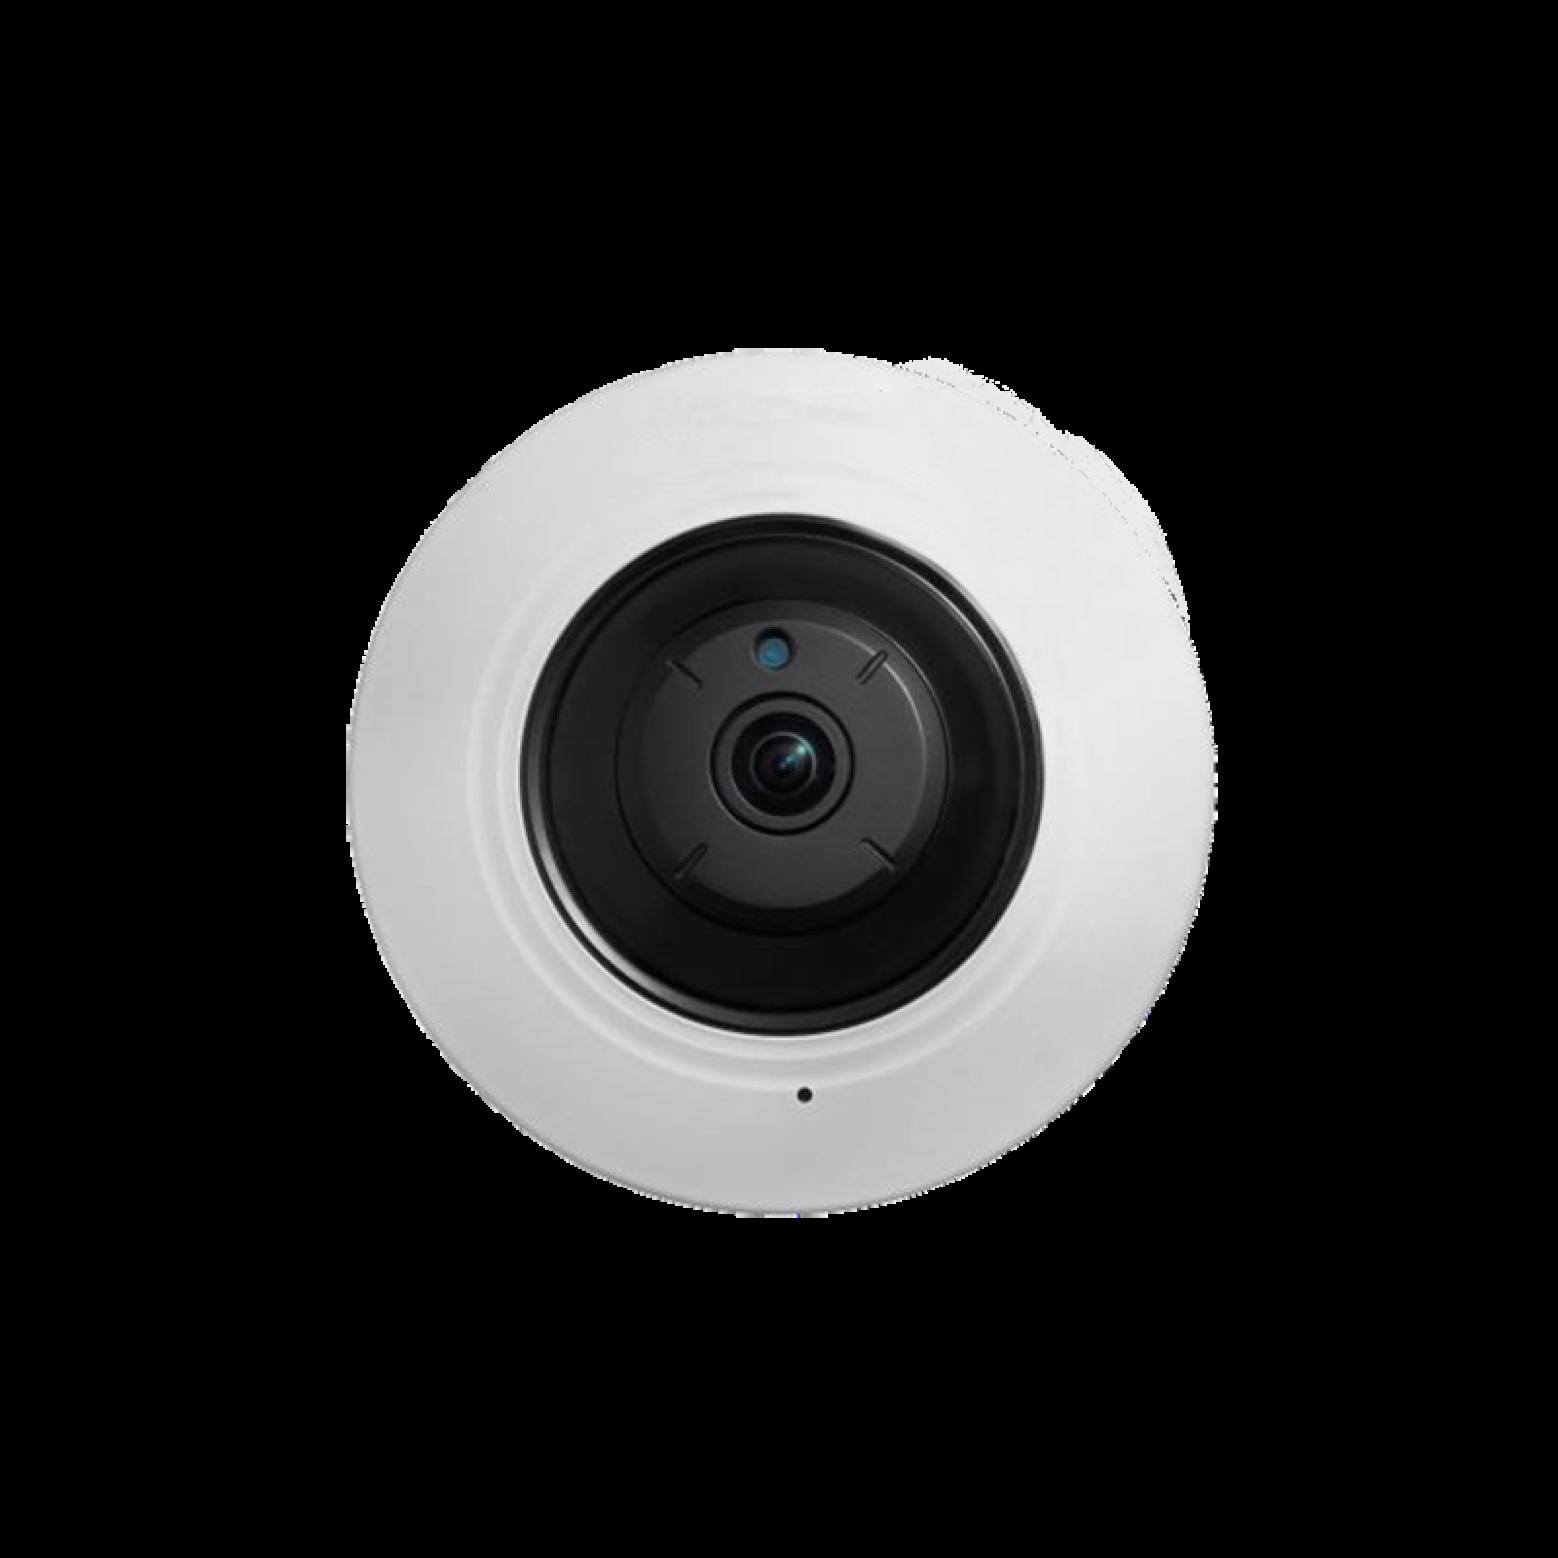 Safire SF-IPDM360W-5, 5 Megapixel, Fish Eye Camera